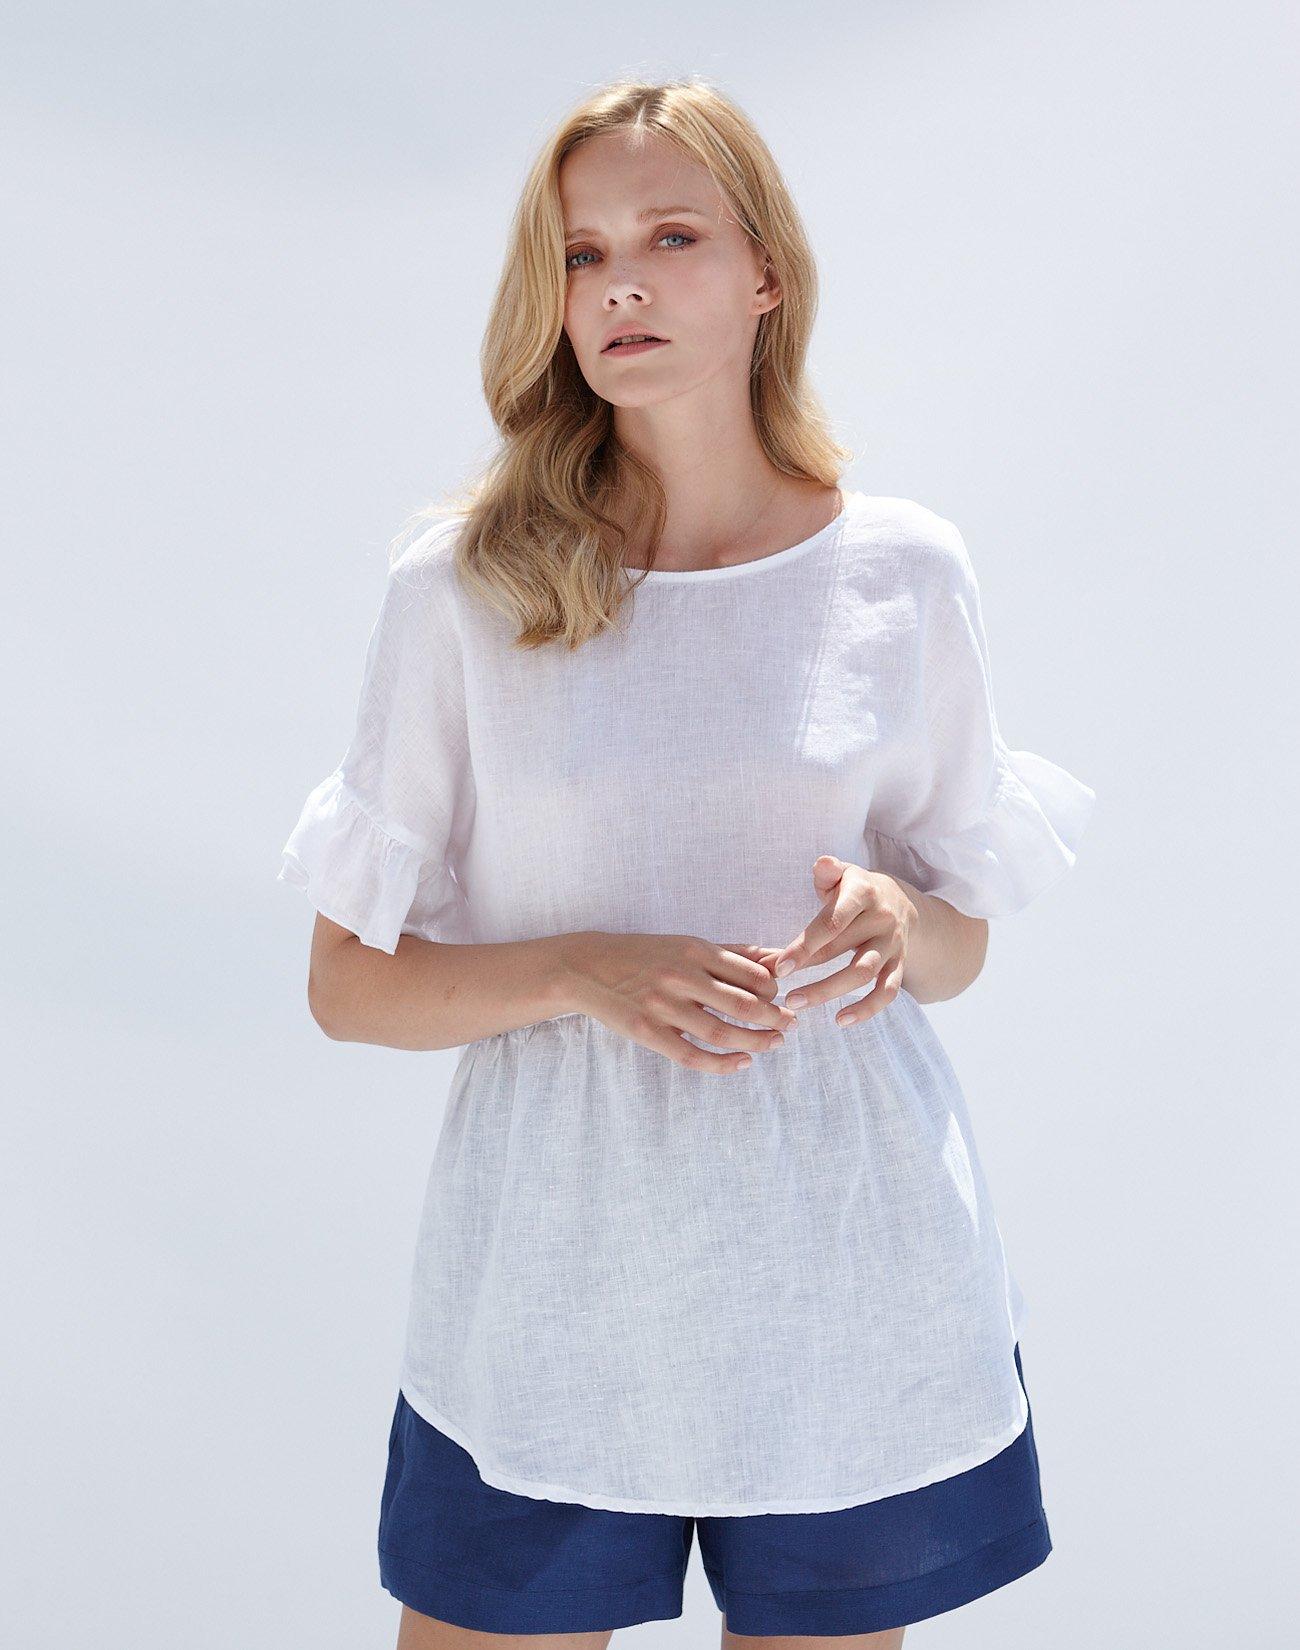 Linen top with ruffles